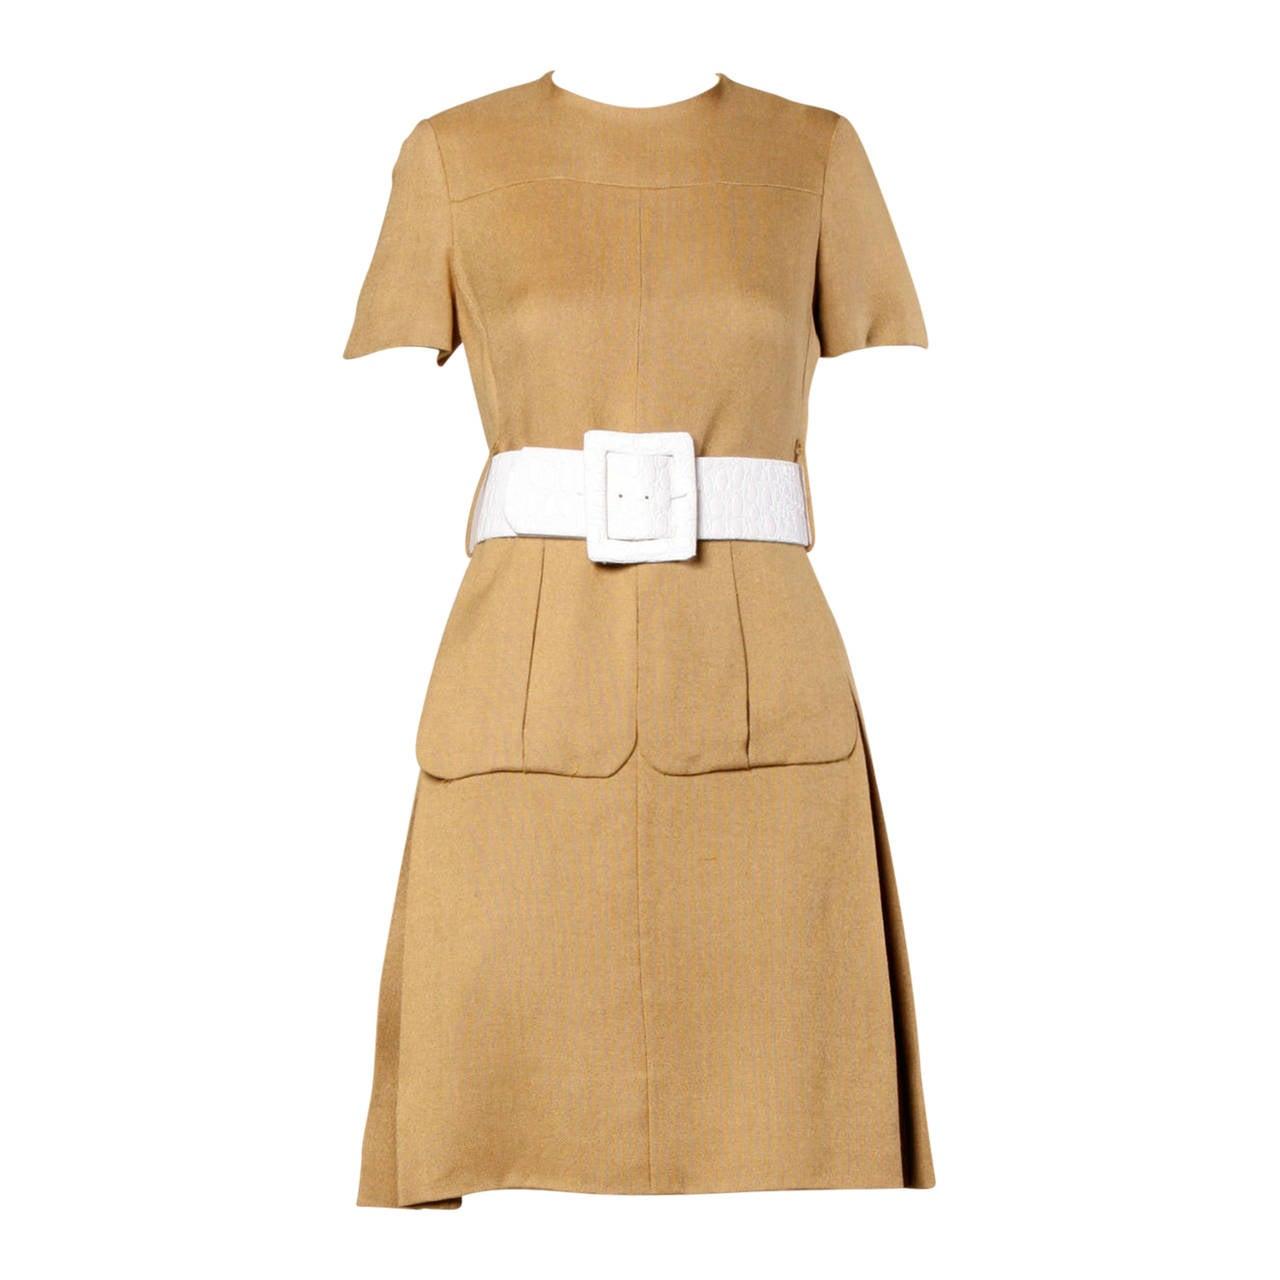 Donald Brooks 1960s Mod Vintage Camel Linen + Silk Dress with Belt